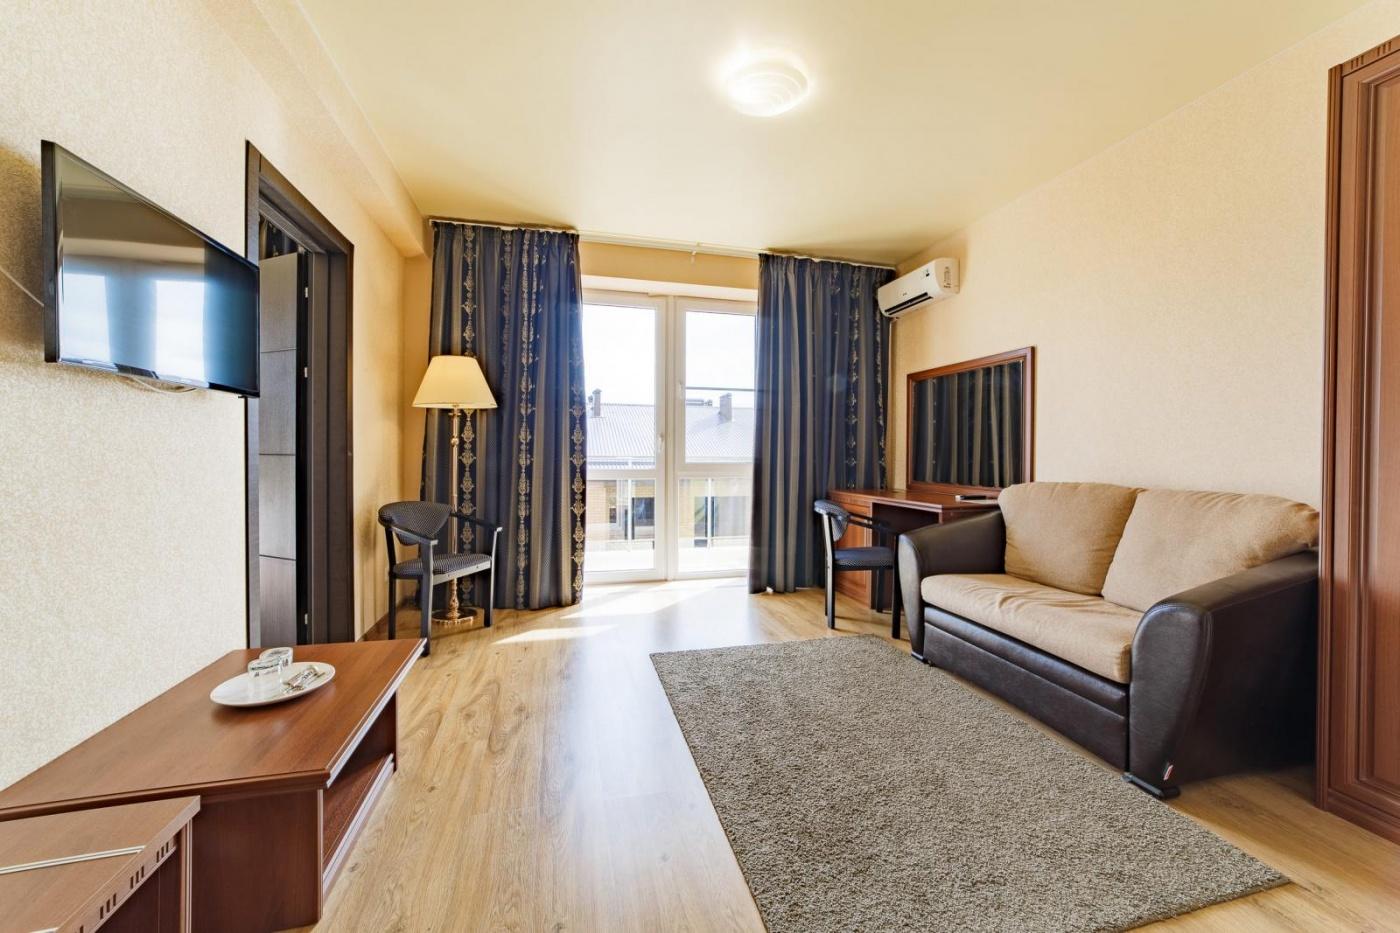 Отель «Relax» Краснодарский край Lux 2-комнатный, фото 3